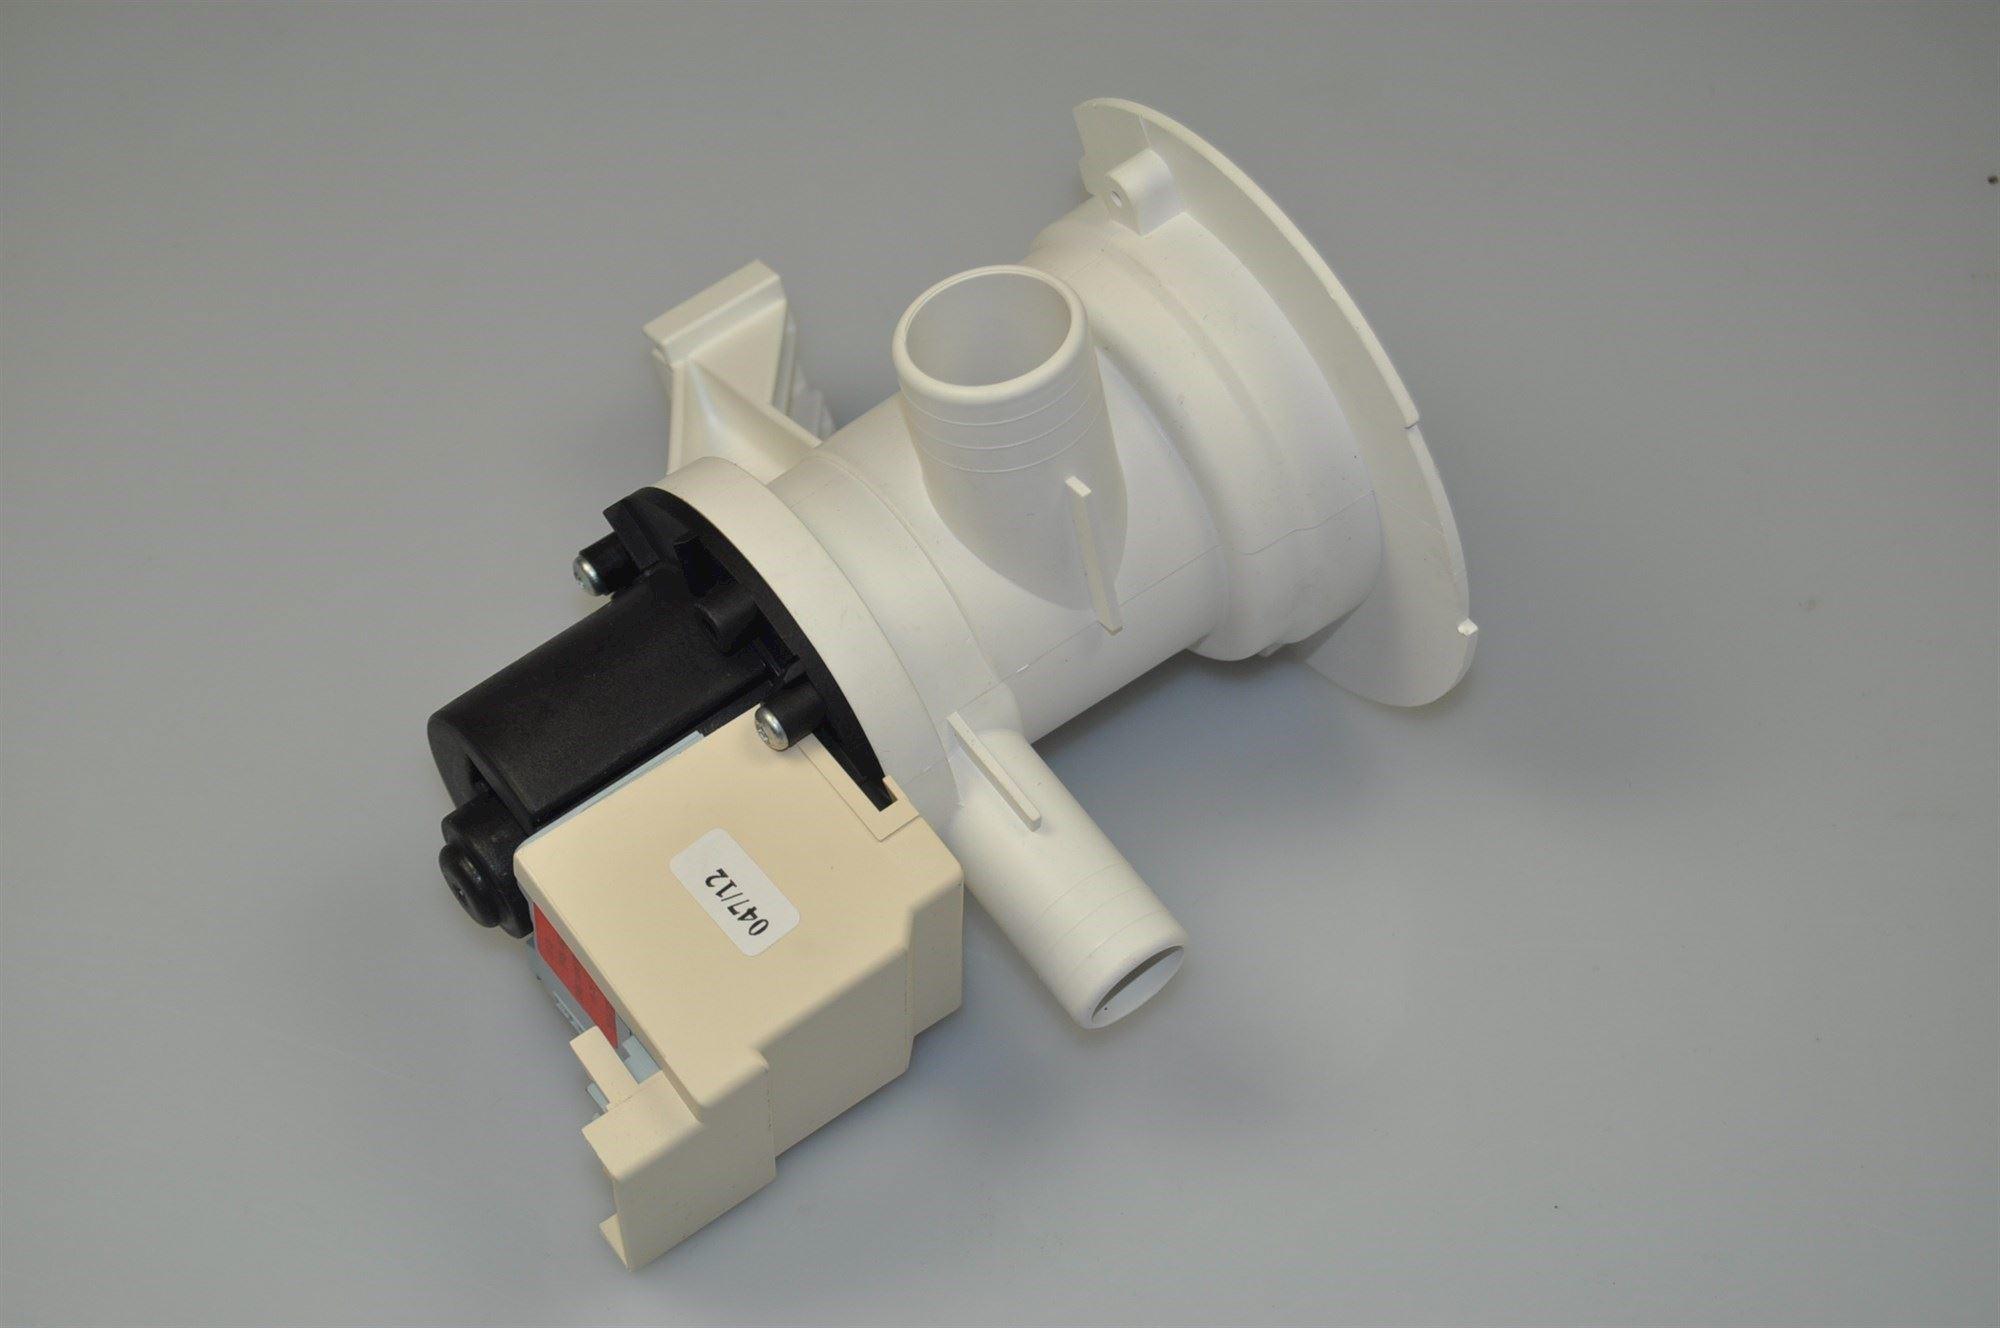 pumpe whirlpool vaskemaskin. Black Bedroom Furniture Sets. Home Design Ideas